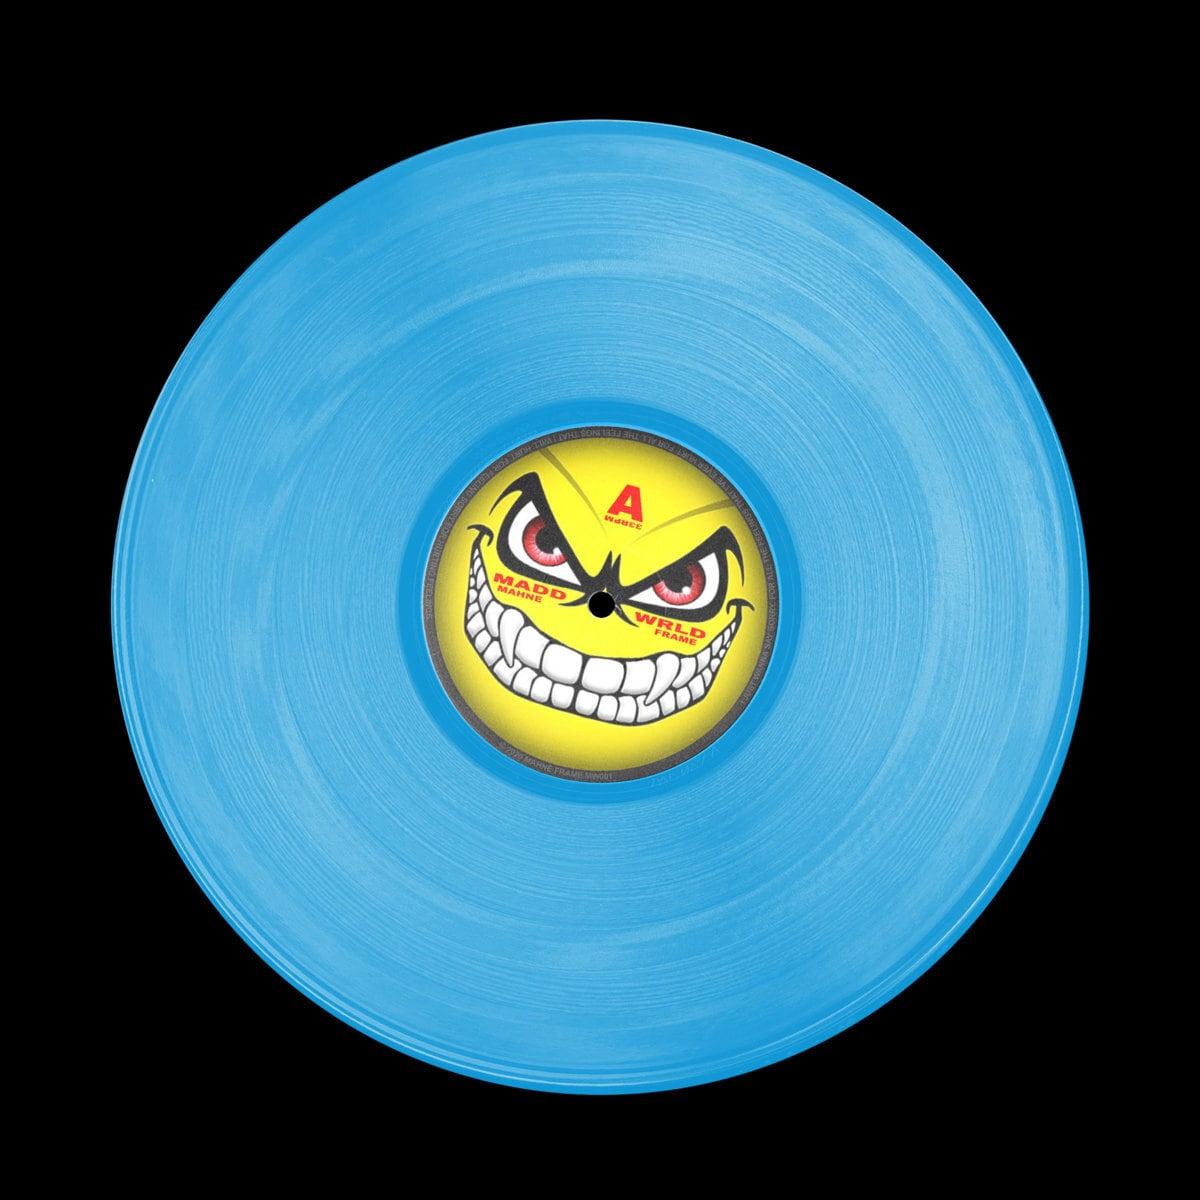 Mahne Frame / MAD WORLD(500 Ltd Sky Blue LP)